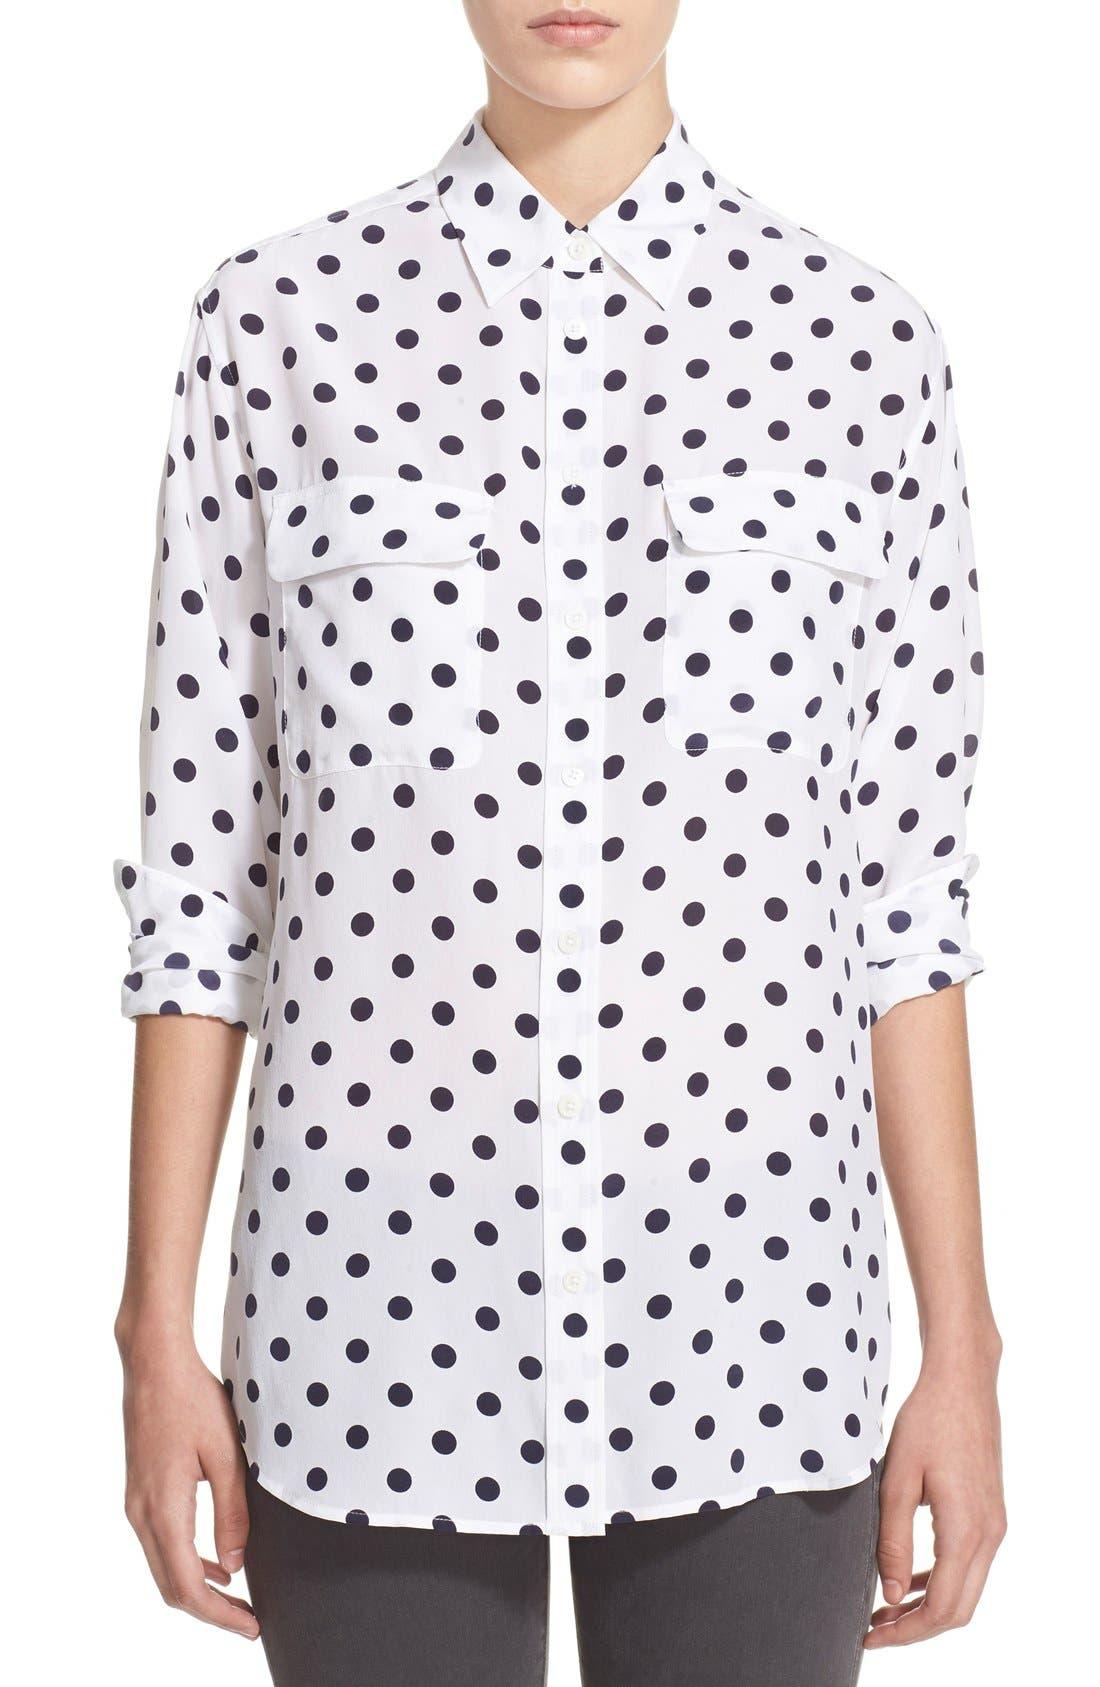 Alternate Image 1 Selected - Equipment 'Signature' Polka Dot Silk Shirt